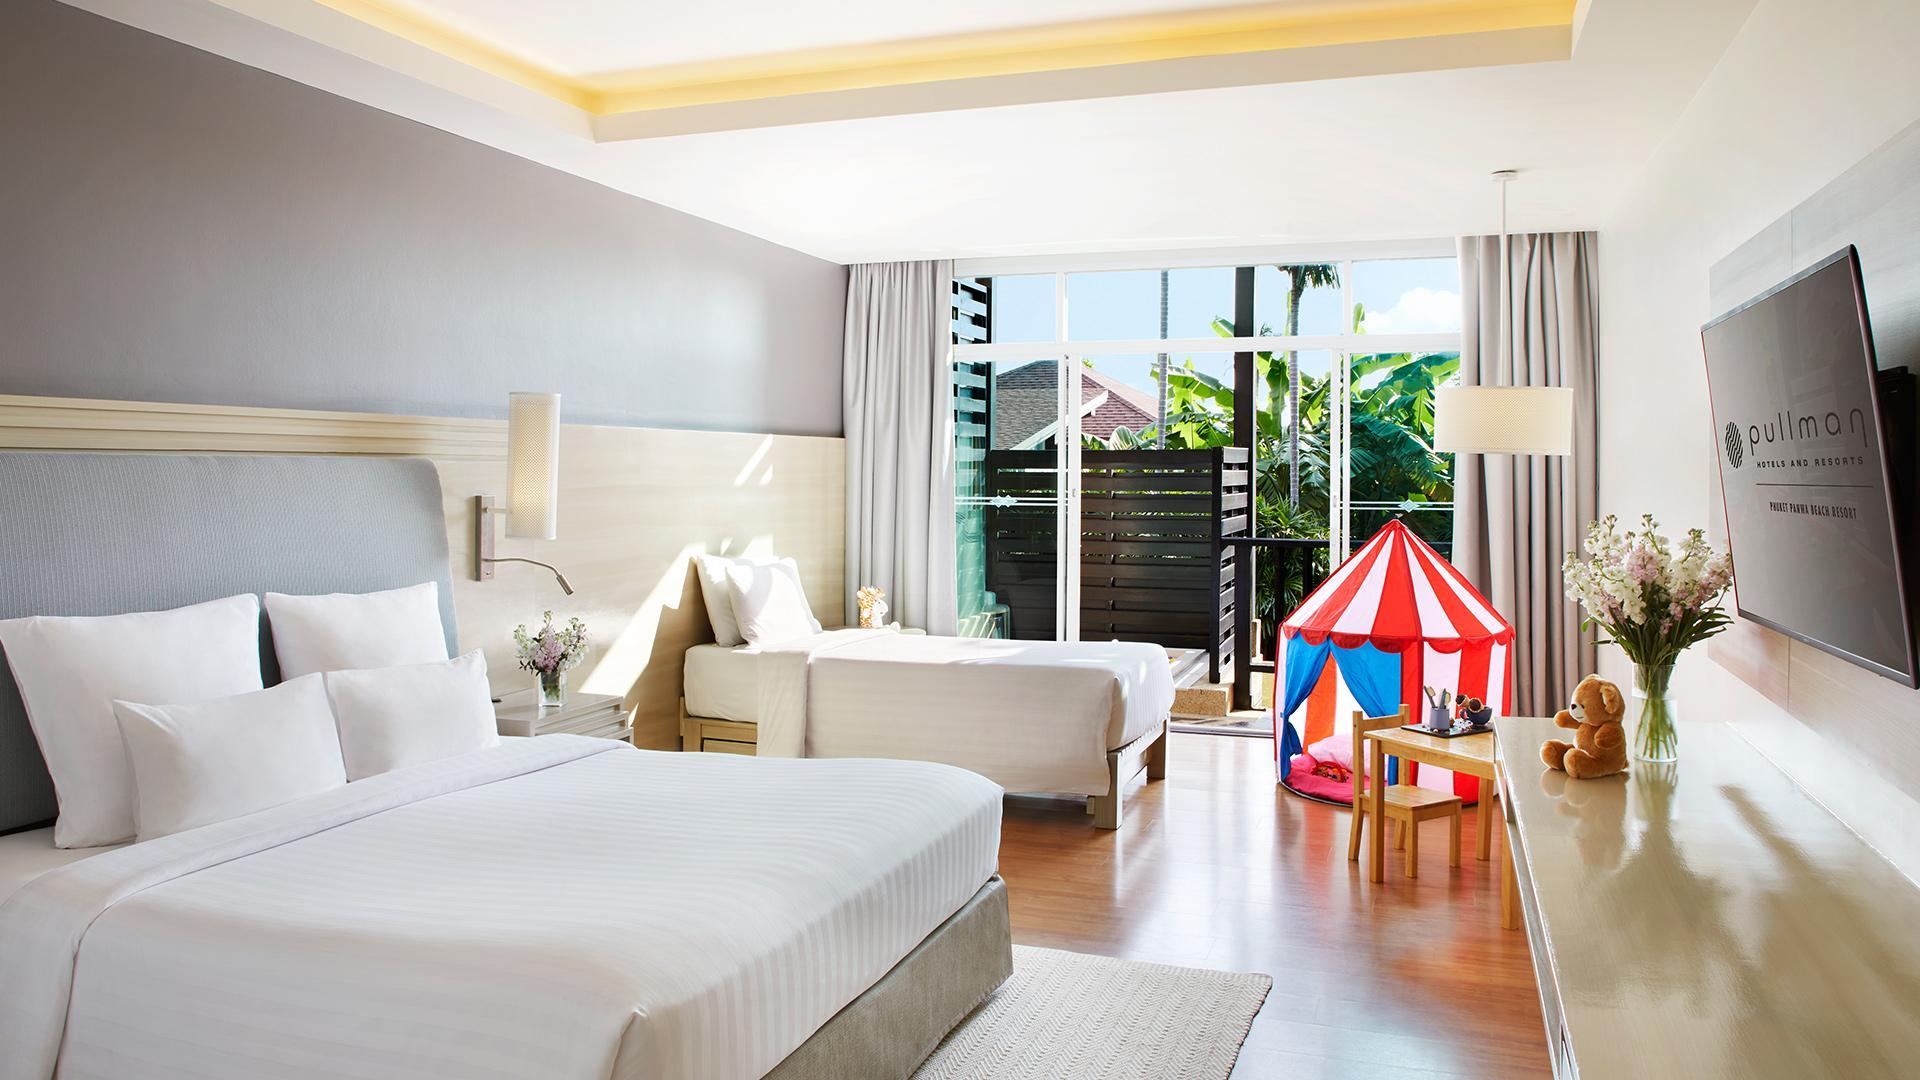 Deluxe Family Room image 1 at Pullman Phuket Panwa Beach Resort by Amphoe Mueang Phuket, Chang Wat Phuket, Thailand